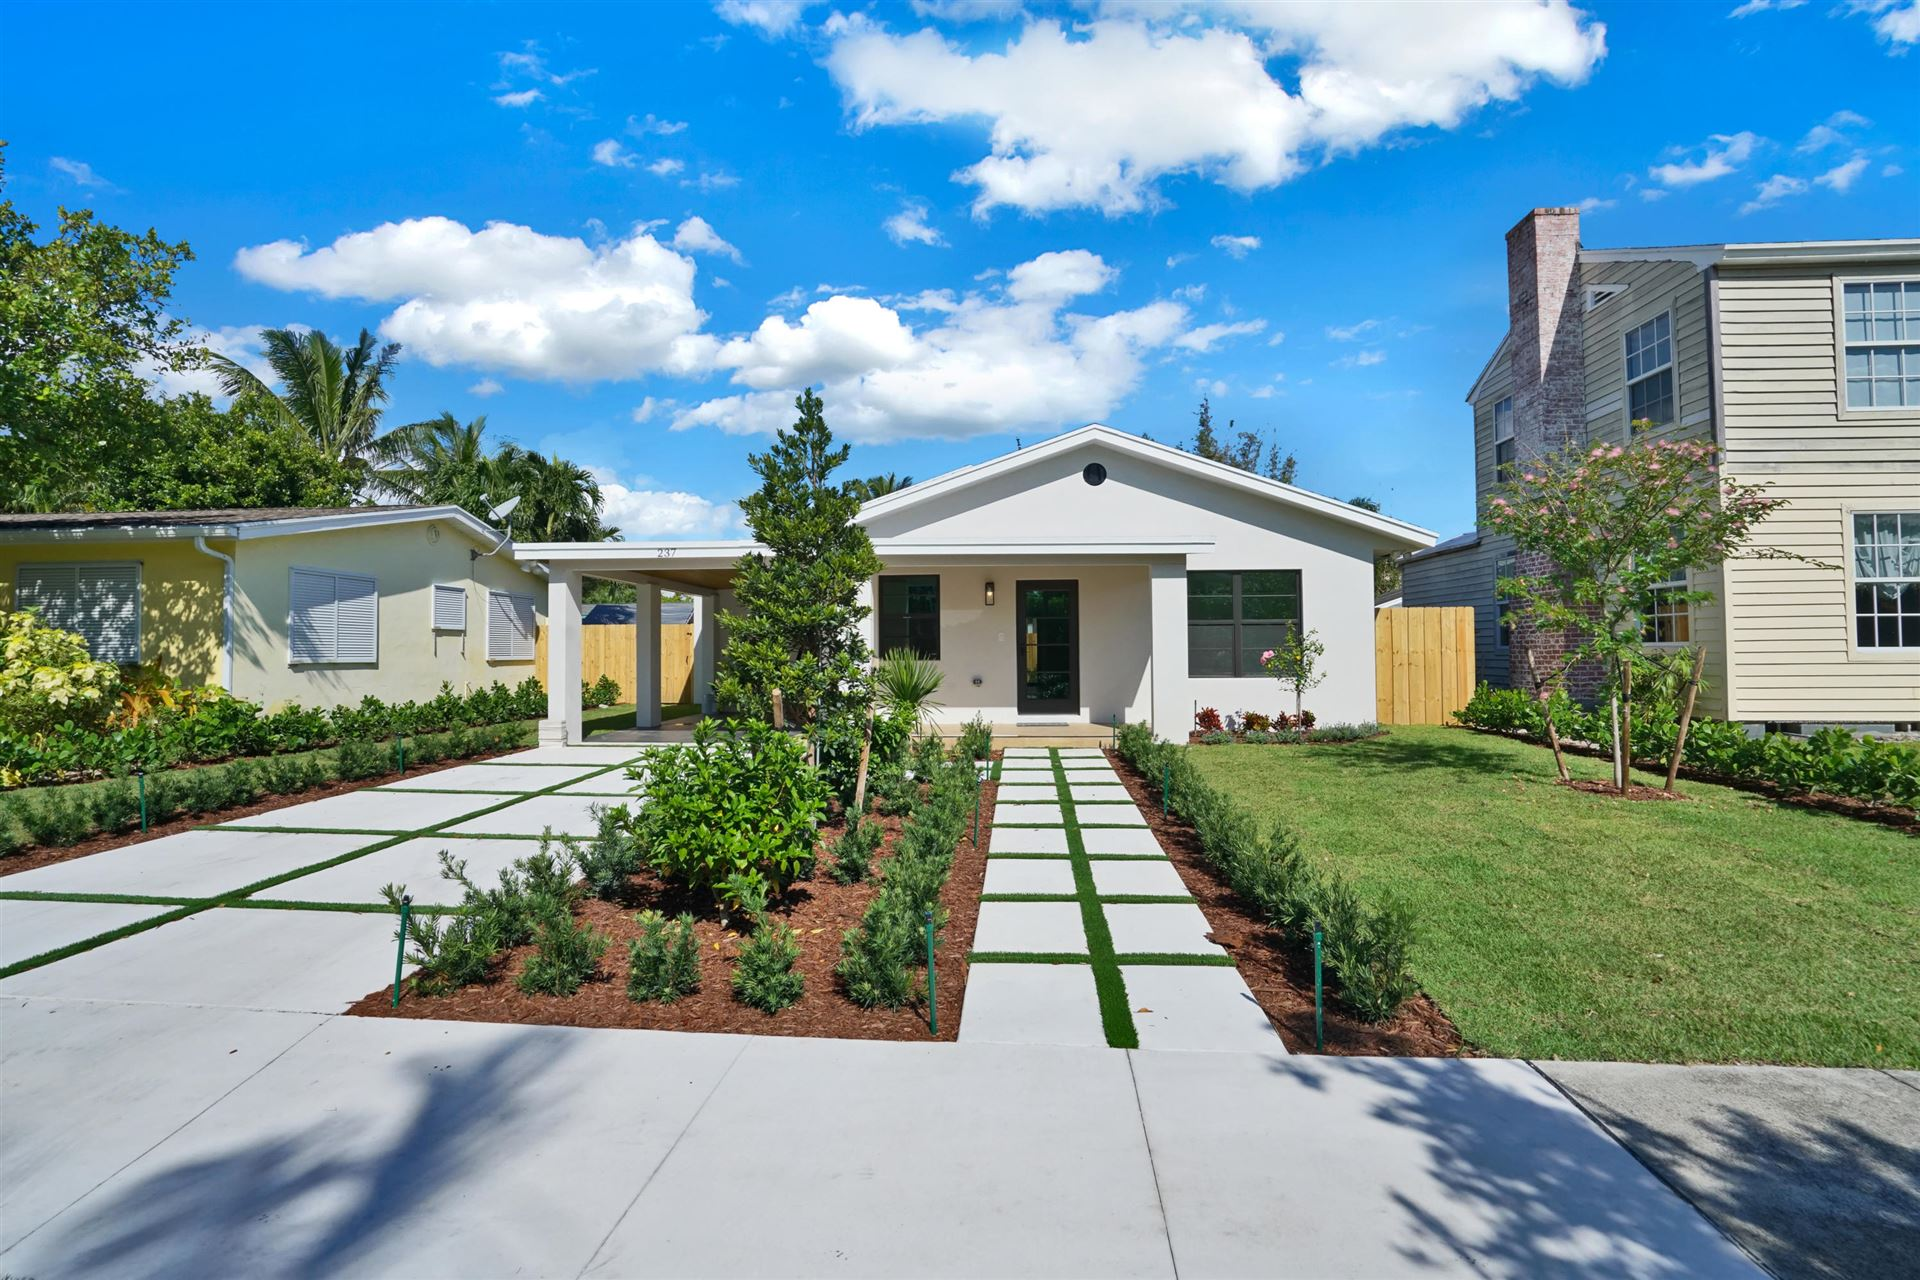 237 Edgewood Drive, West Palm Beach, FL 33405 - #: RX-10673030